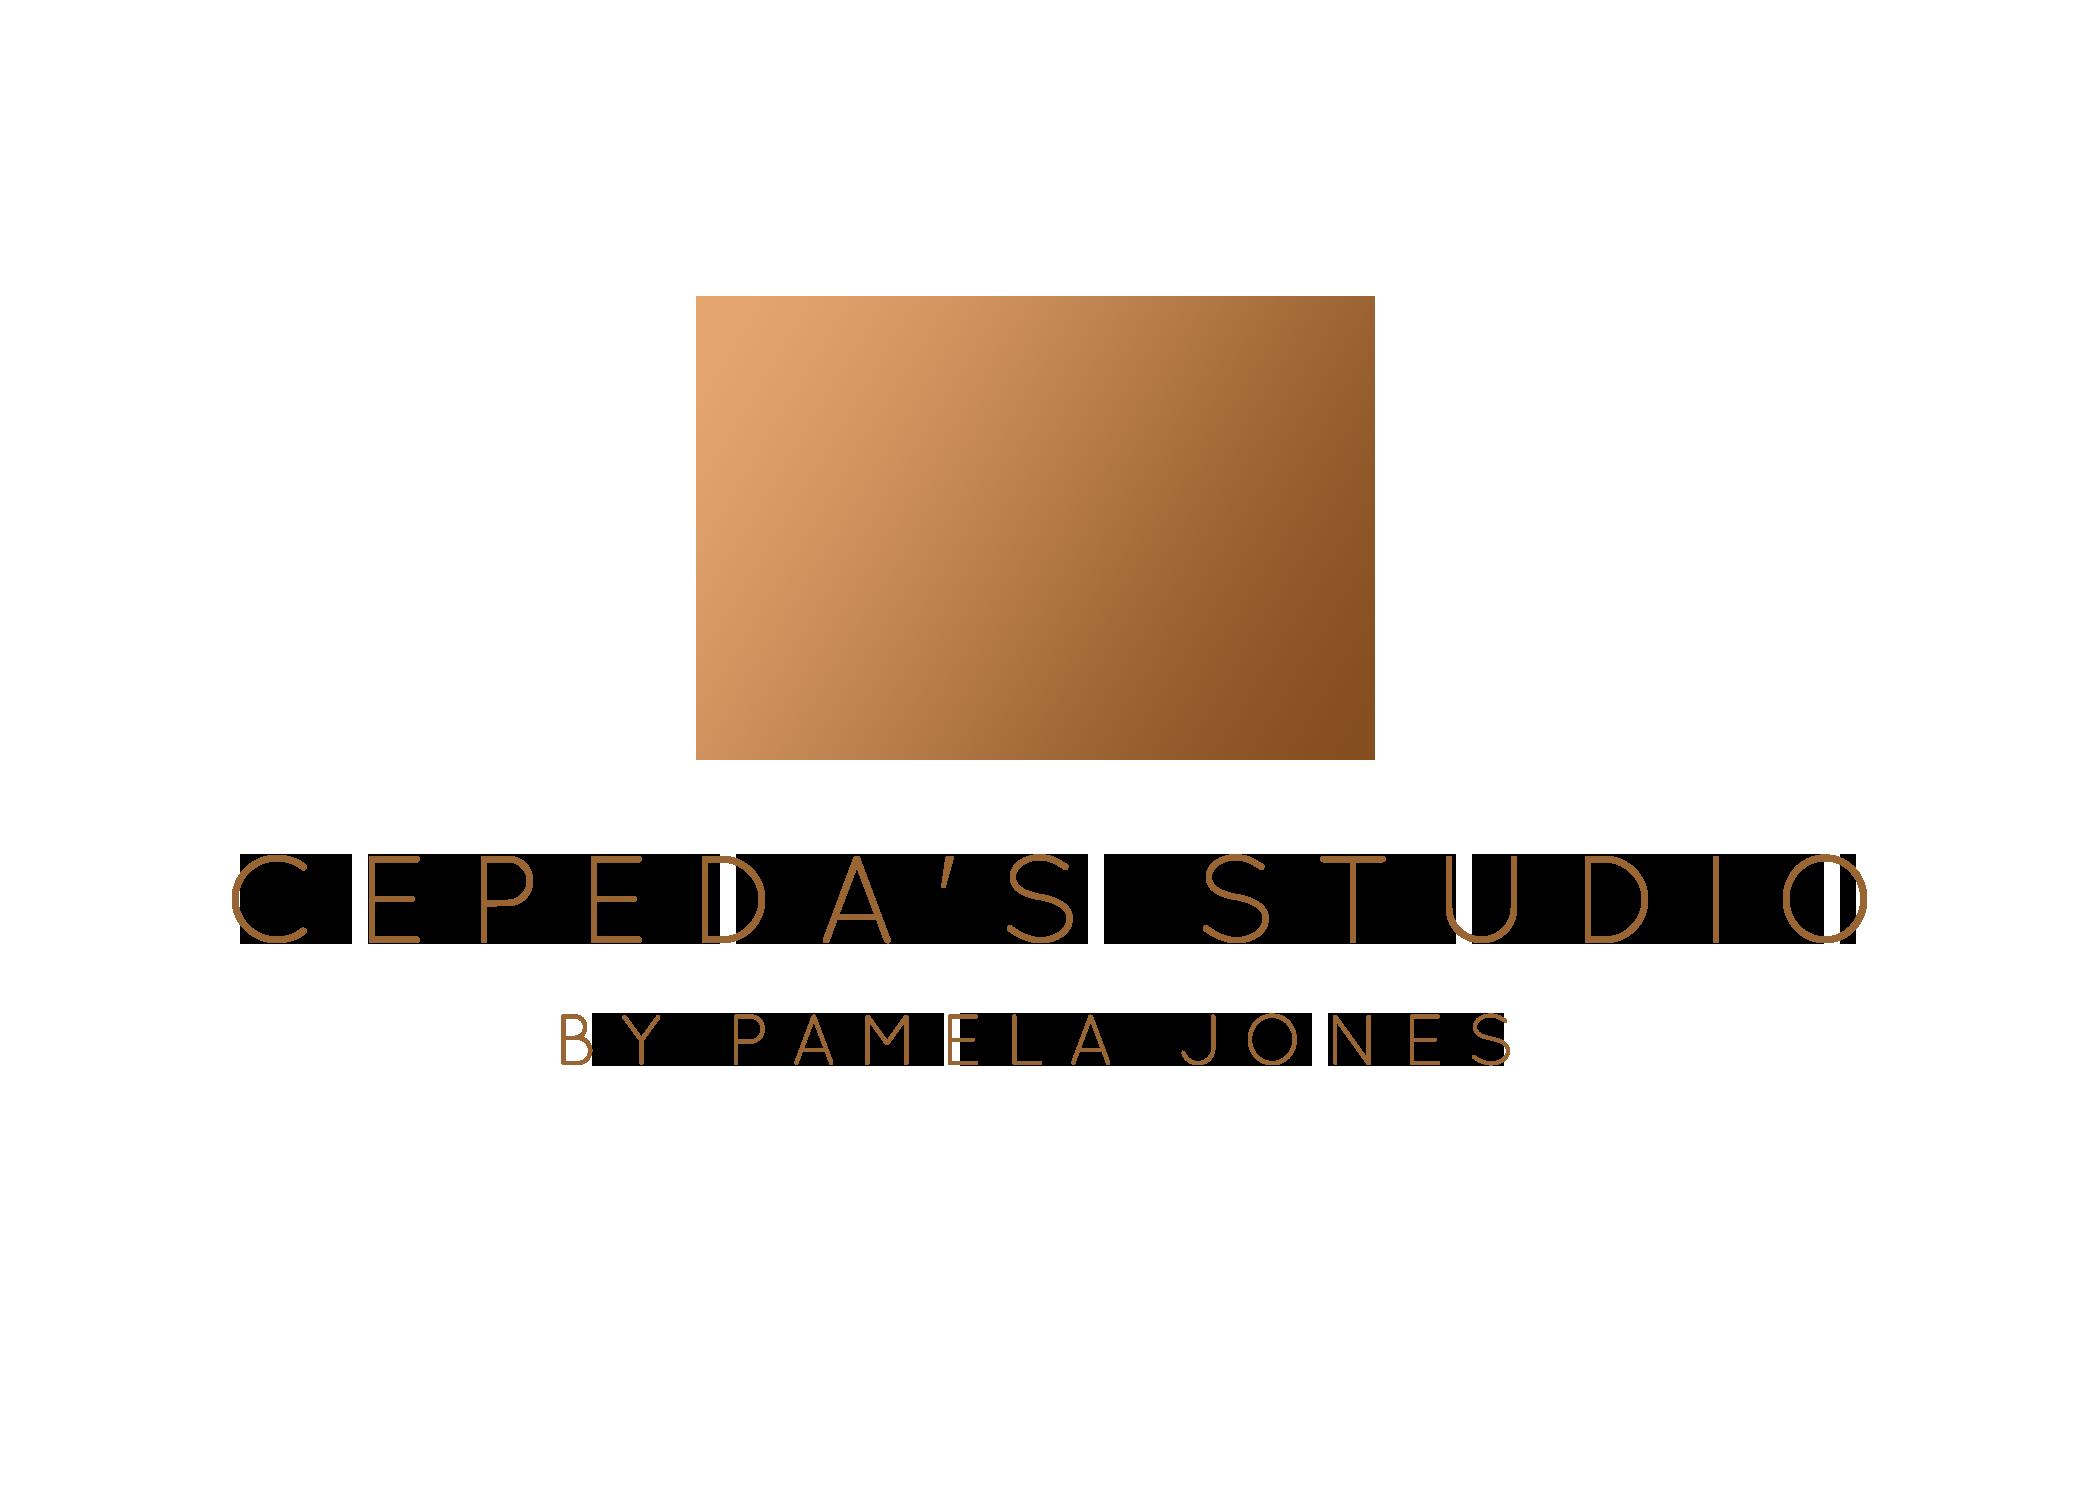 Cepeda's Studio